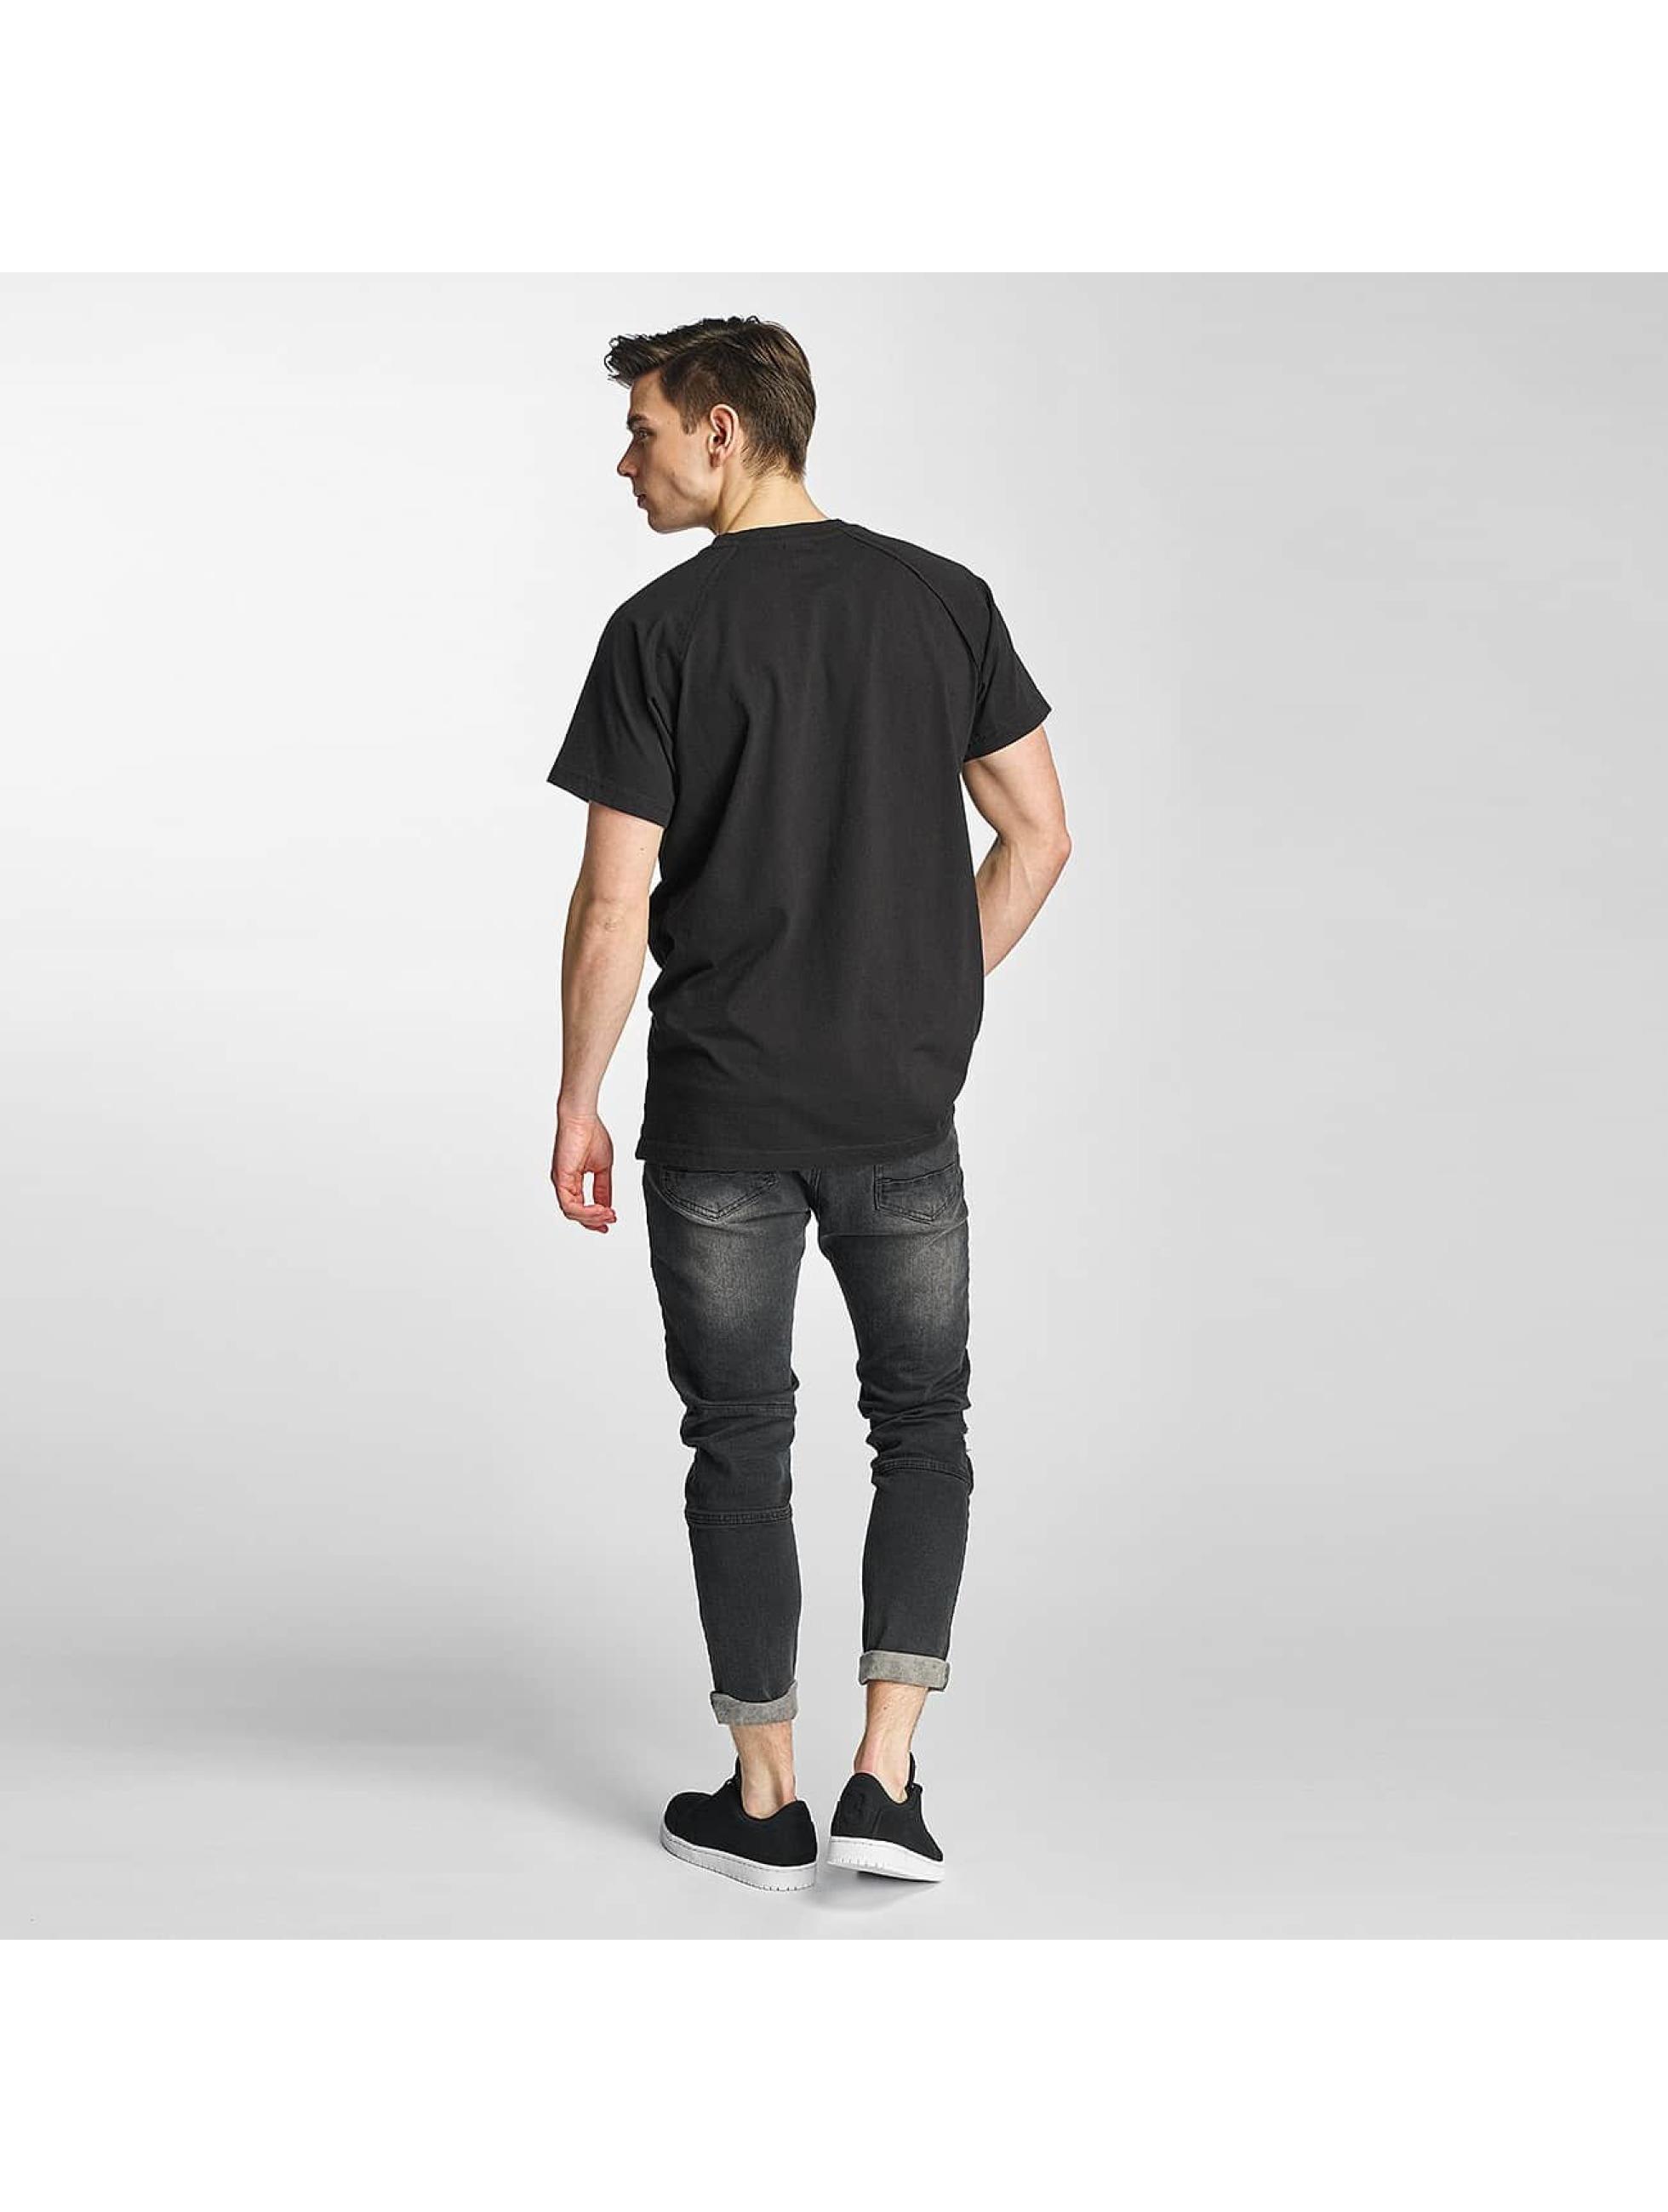 Urban Classics T-Shirt Ripped black